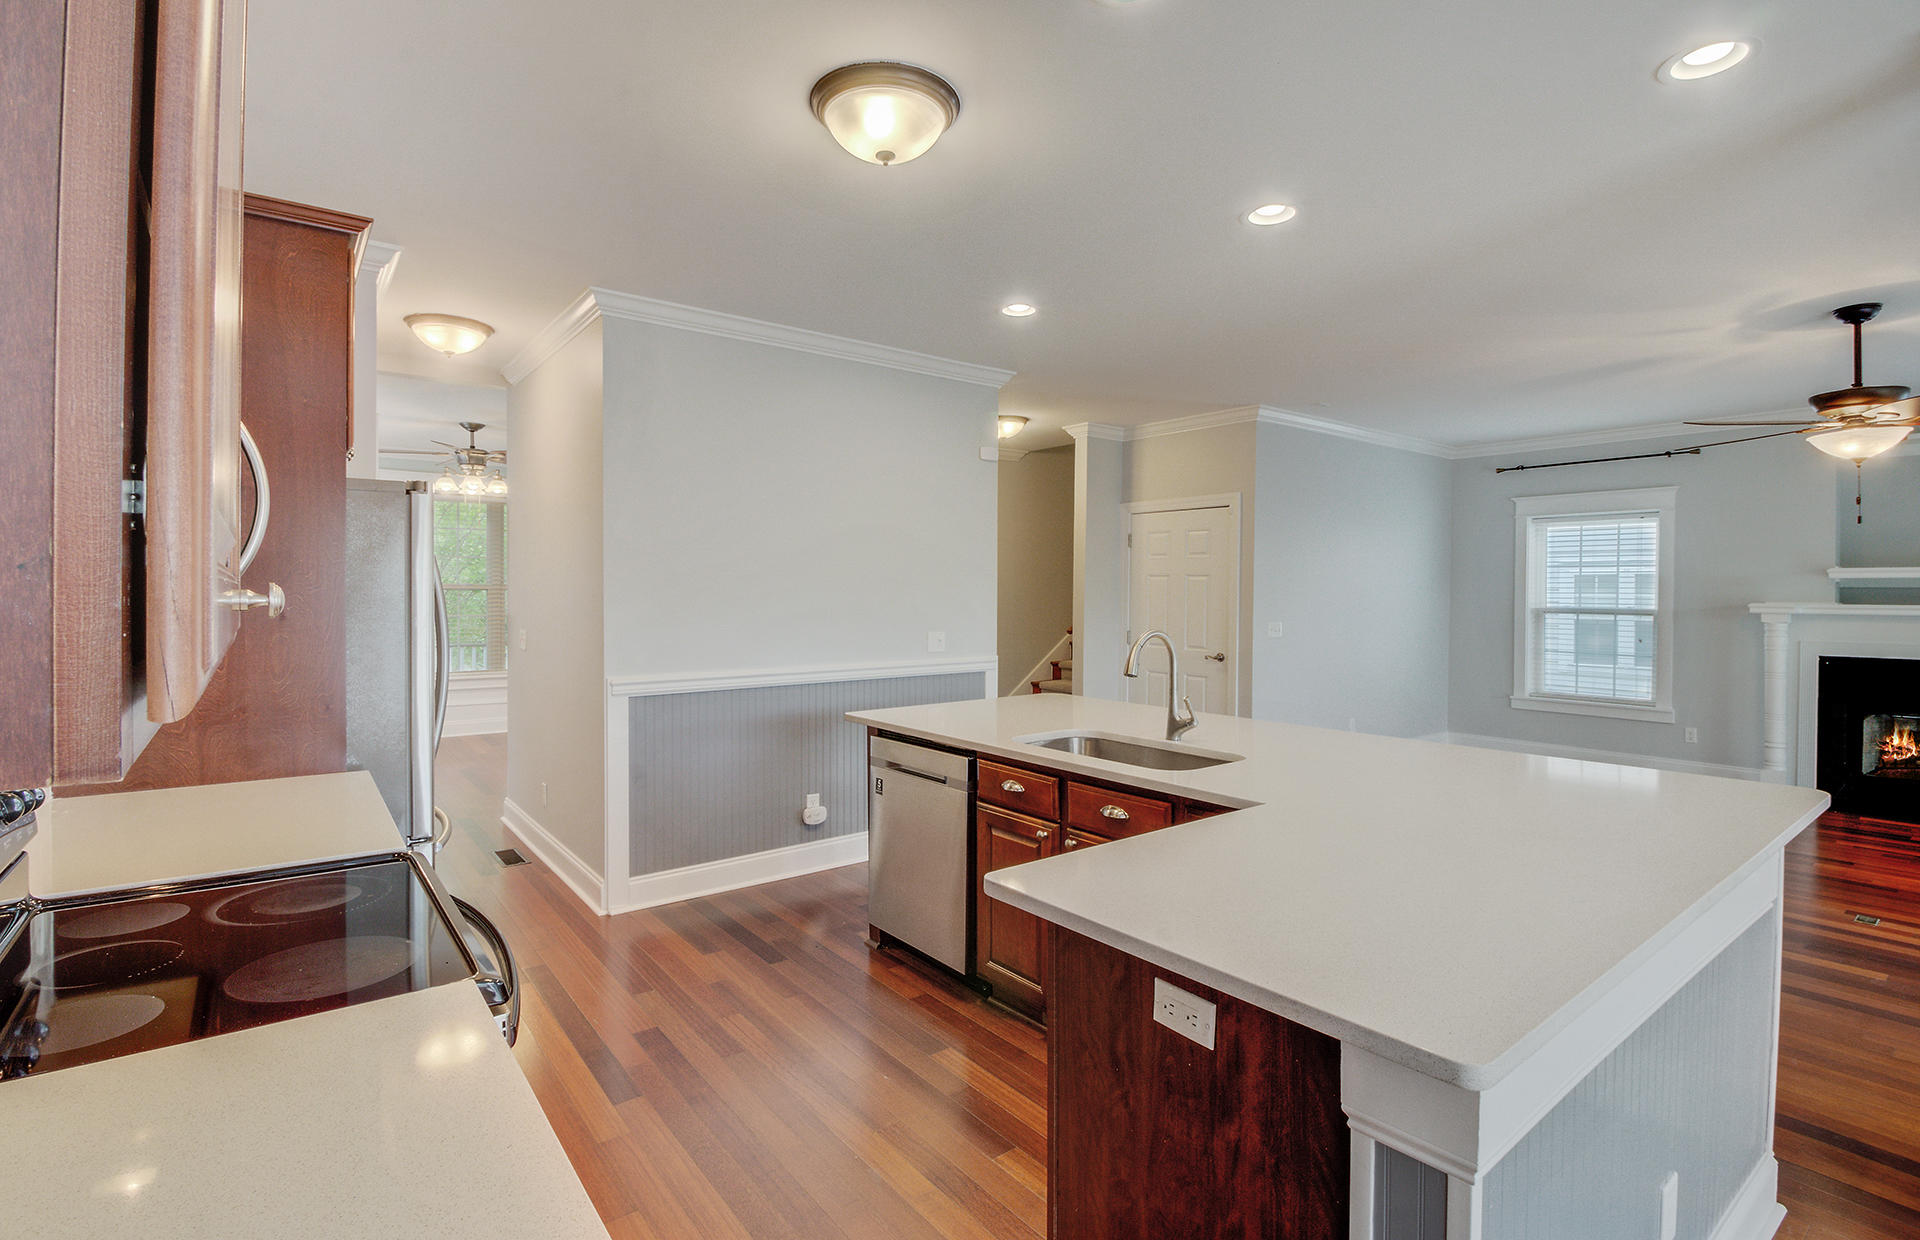 Daniel Island Homes For Sale - 306 Ladd, Charleston, SC - 13